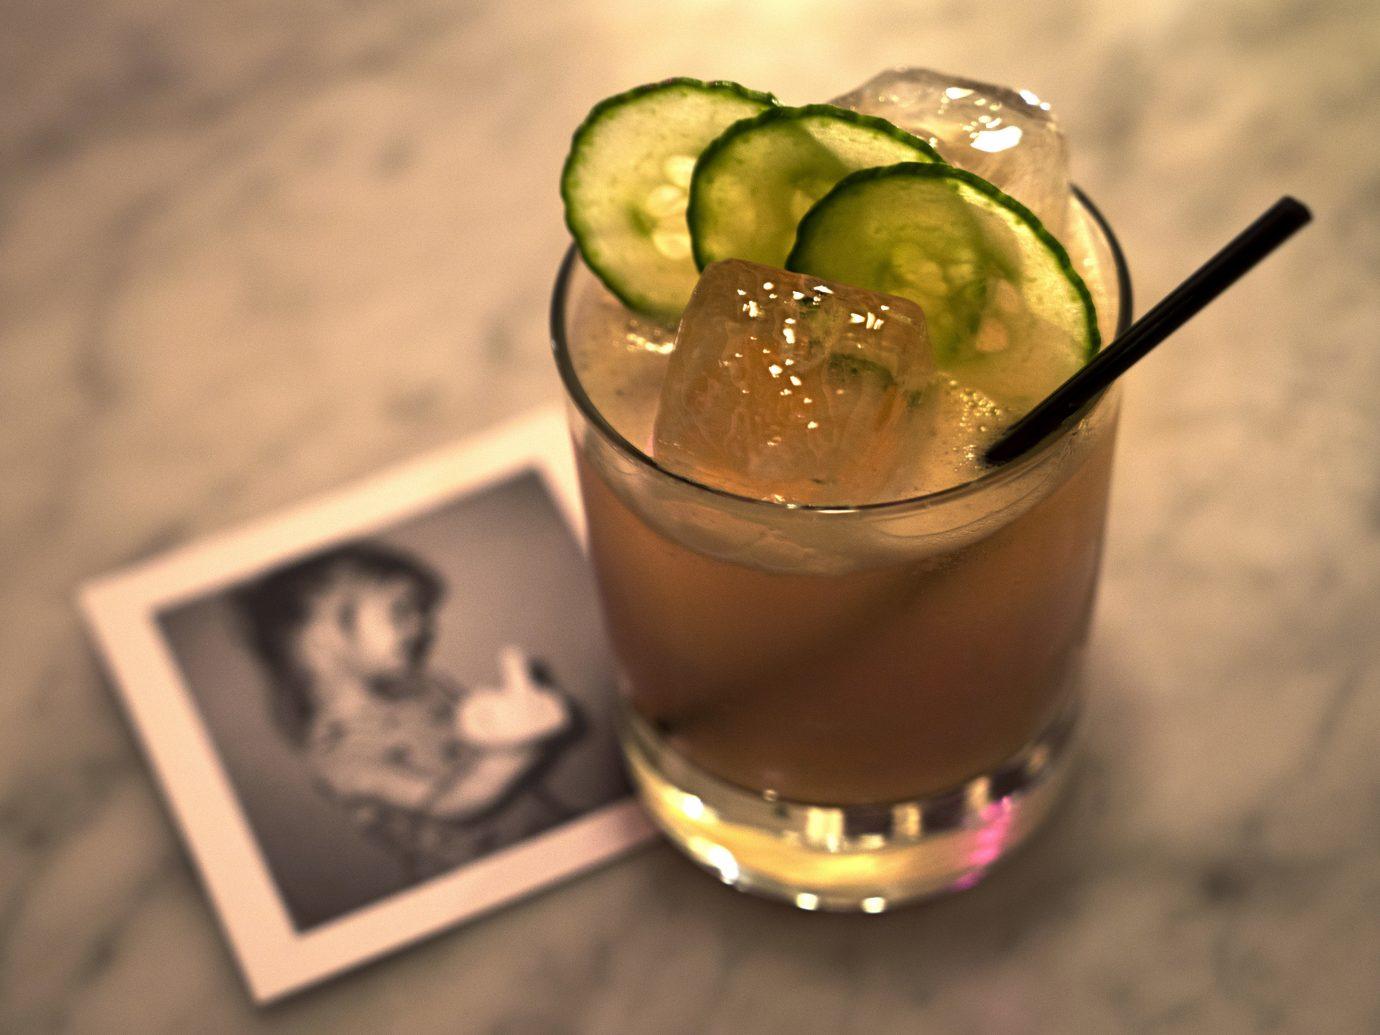 City Trip Ideas Weekend Getaways cup table Drink indoor cocktail mai tai caipirinha non alcoholic beverage cocktail garnish cuba libre moscow mule mint julep margarita dark n stormy